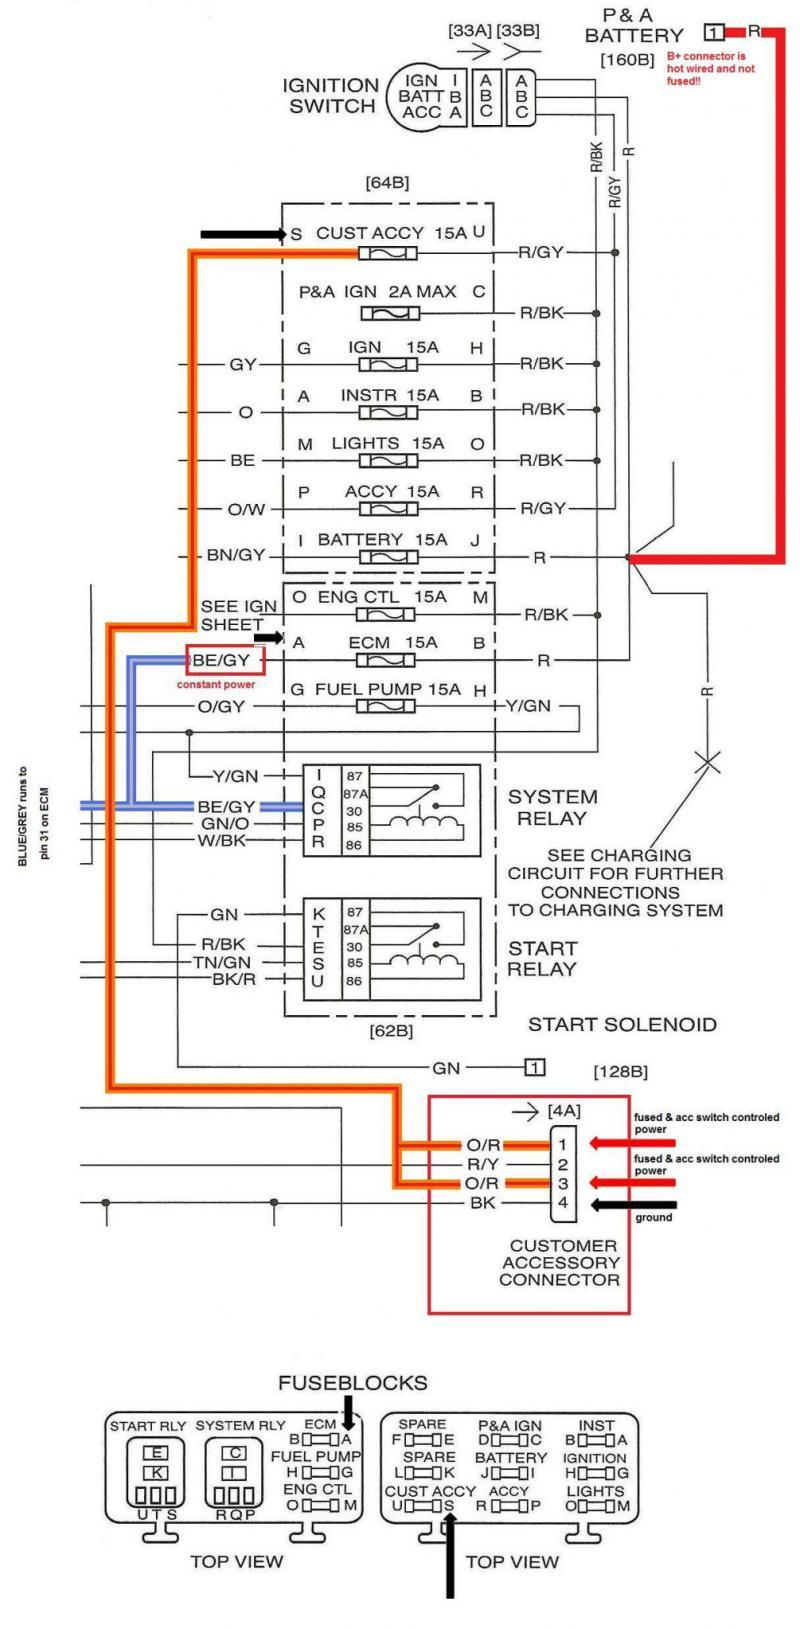 1995 Harley Davidson Sportster 1200 Wiring Diagram